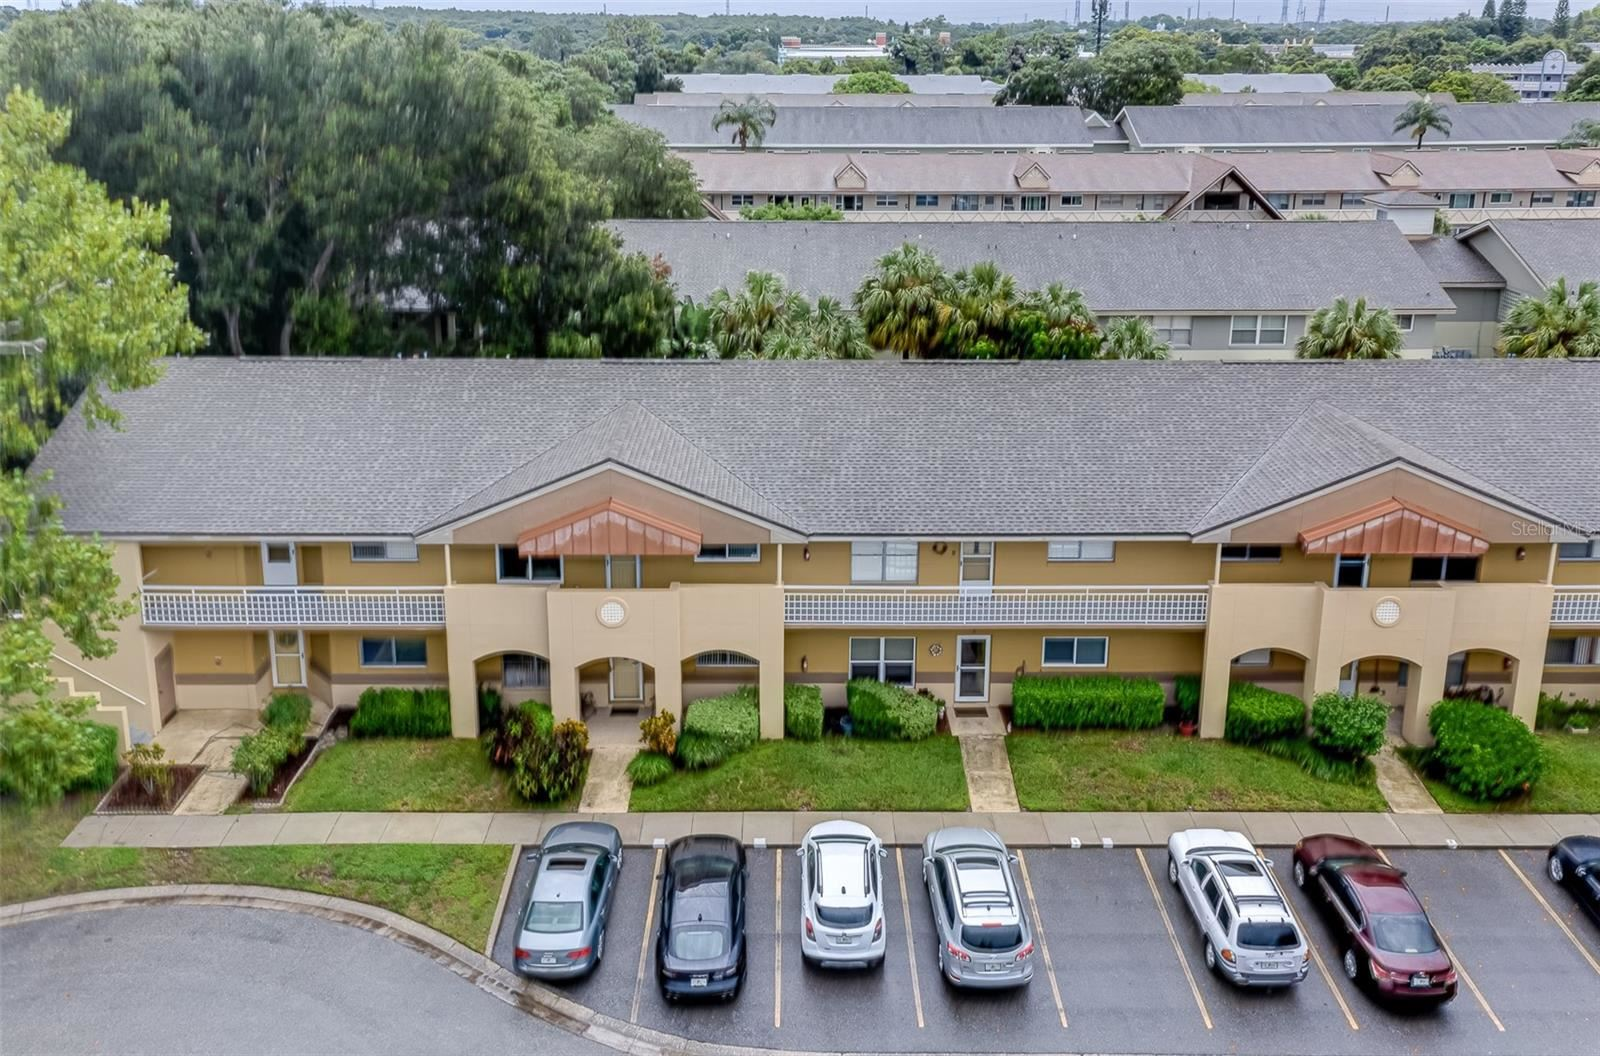 2293 AUSTRIAN LANE #25, Clearwater, FL 33763 - #: U8132032